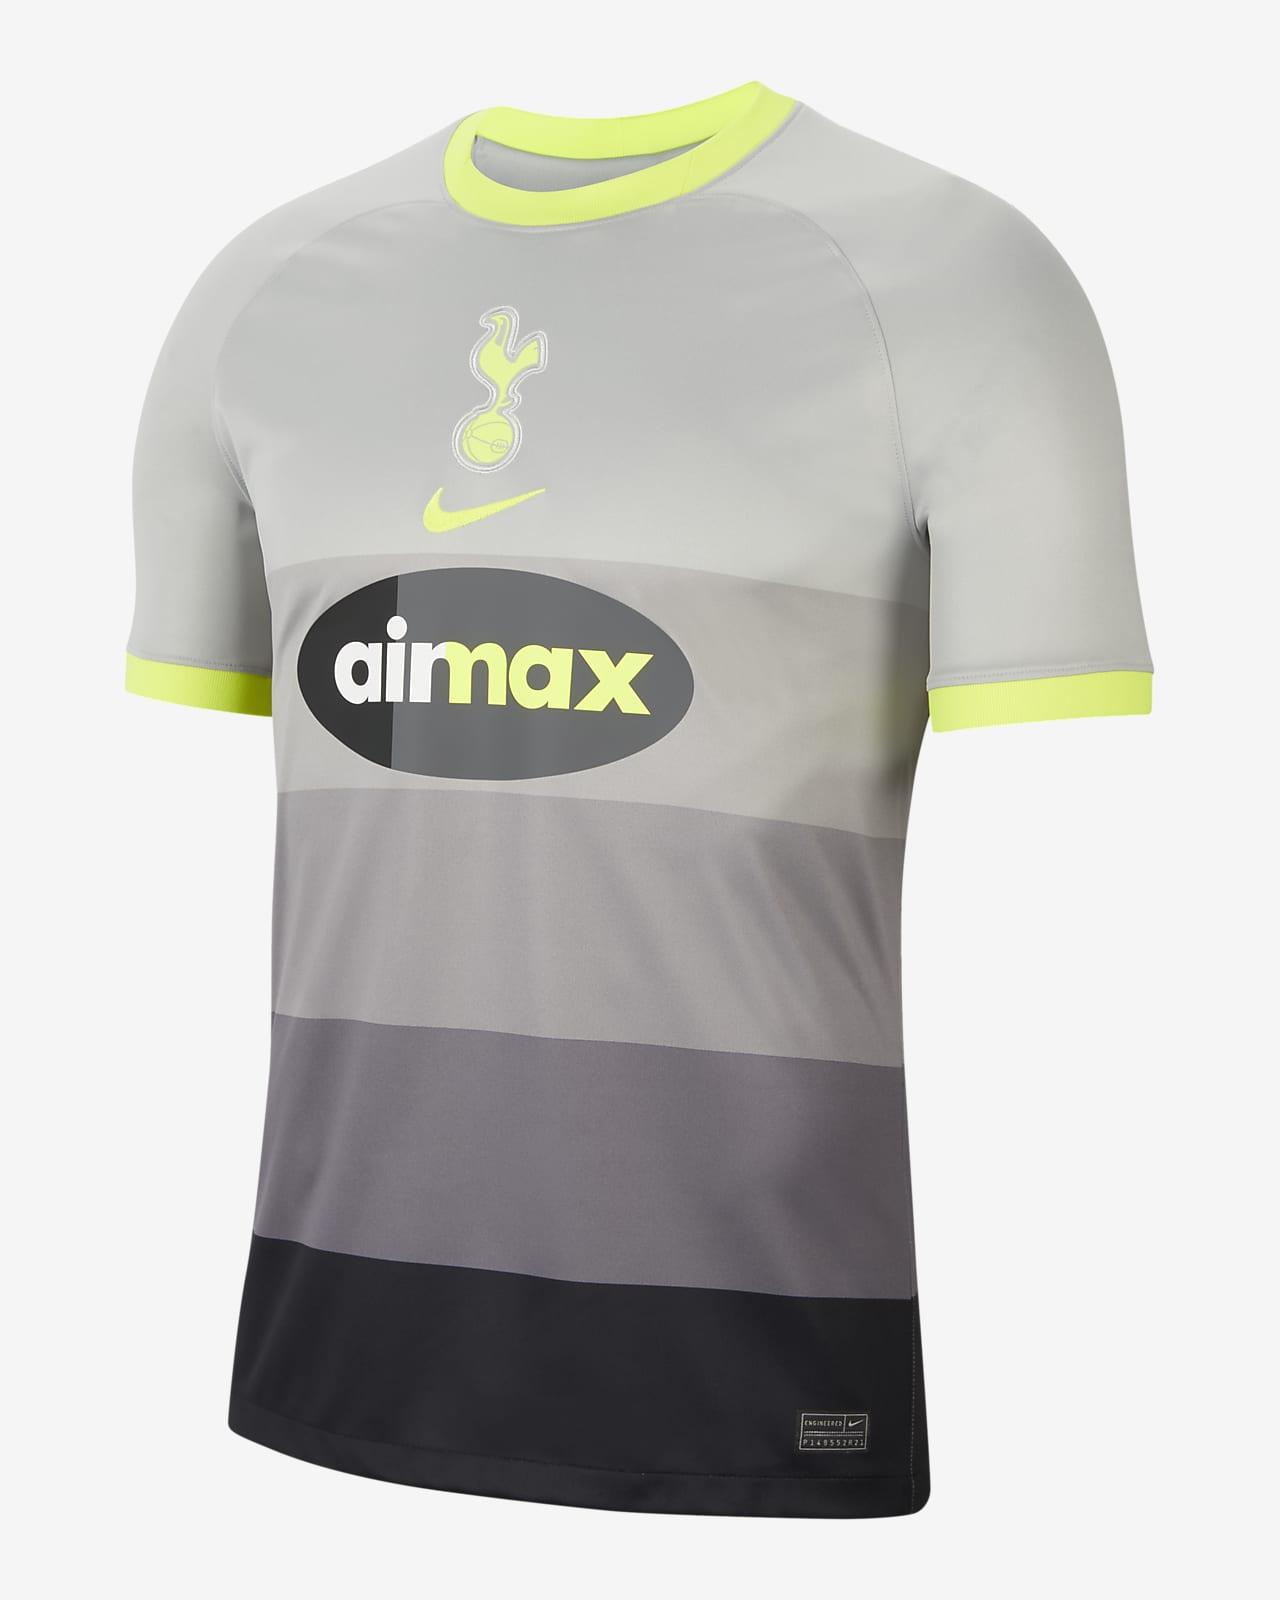 Tottenham Hotspur Stadium Air Max-fodboldtrøje til mænd